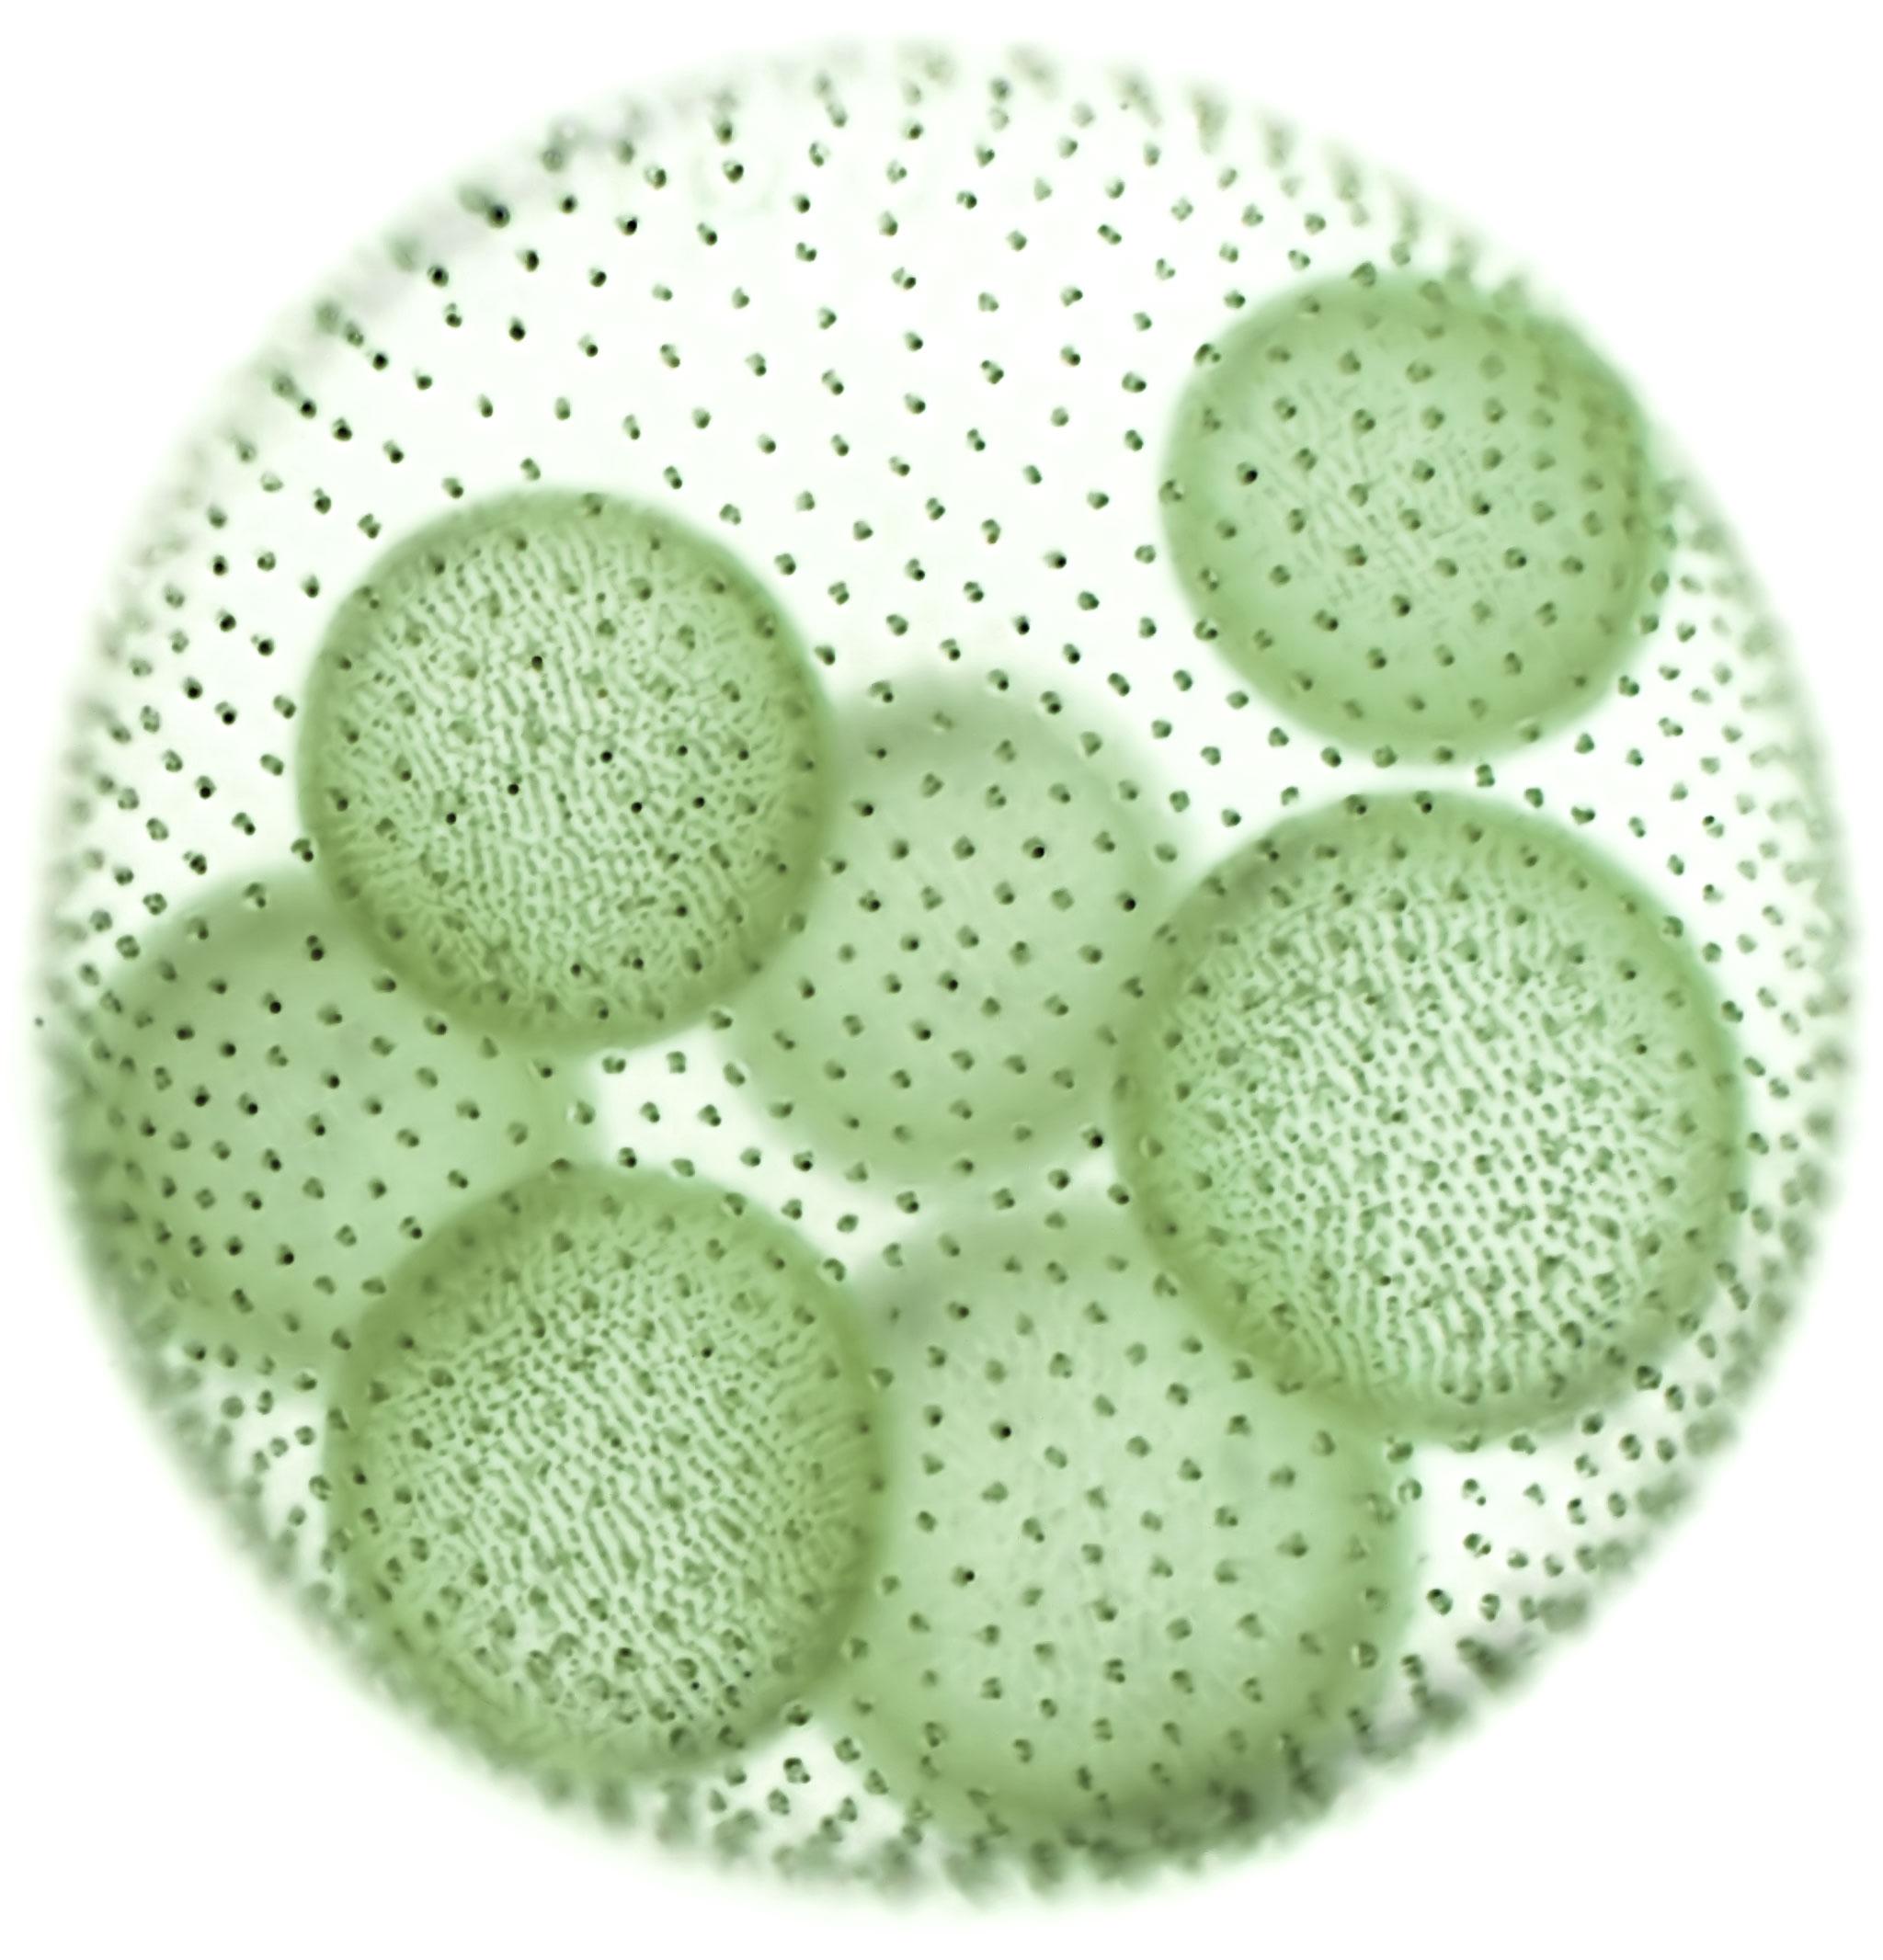 Algae cell